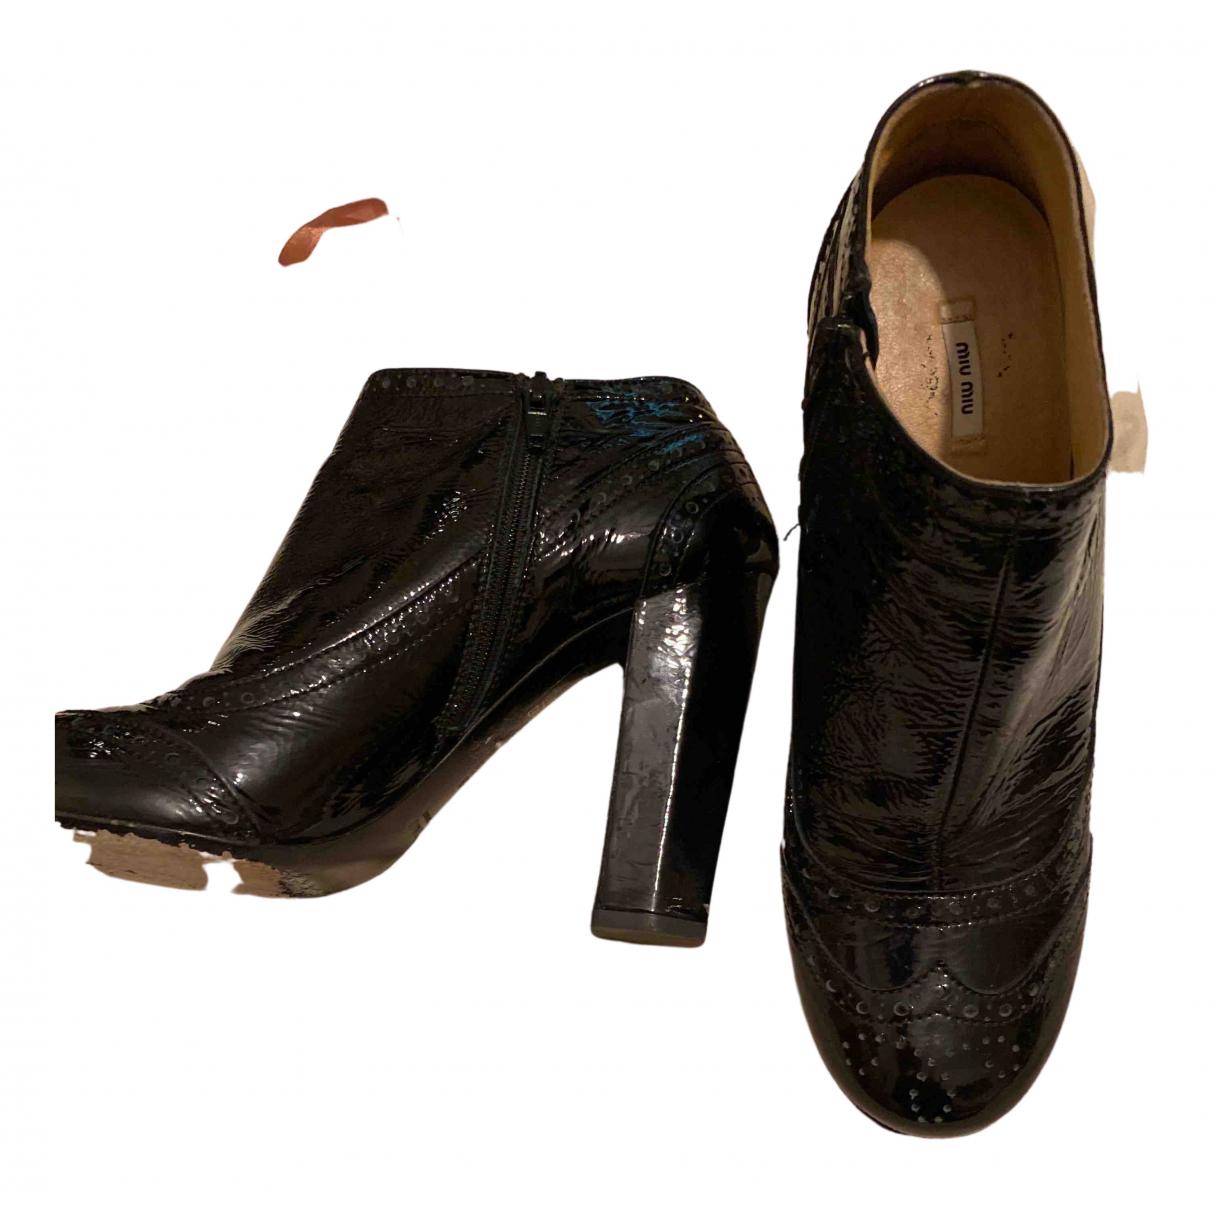 Miu Miu N Black Patent leather Ankle boots for Women 39 EU